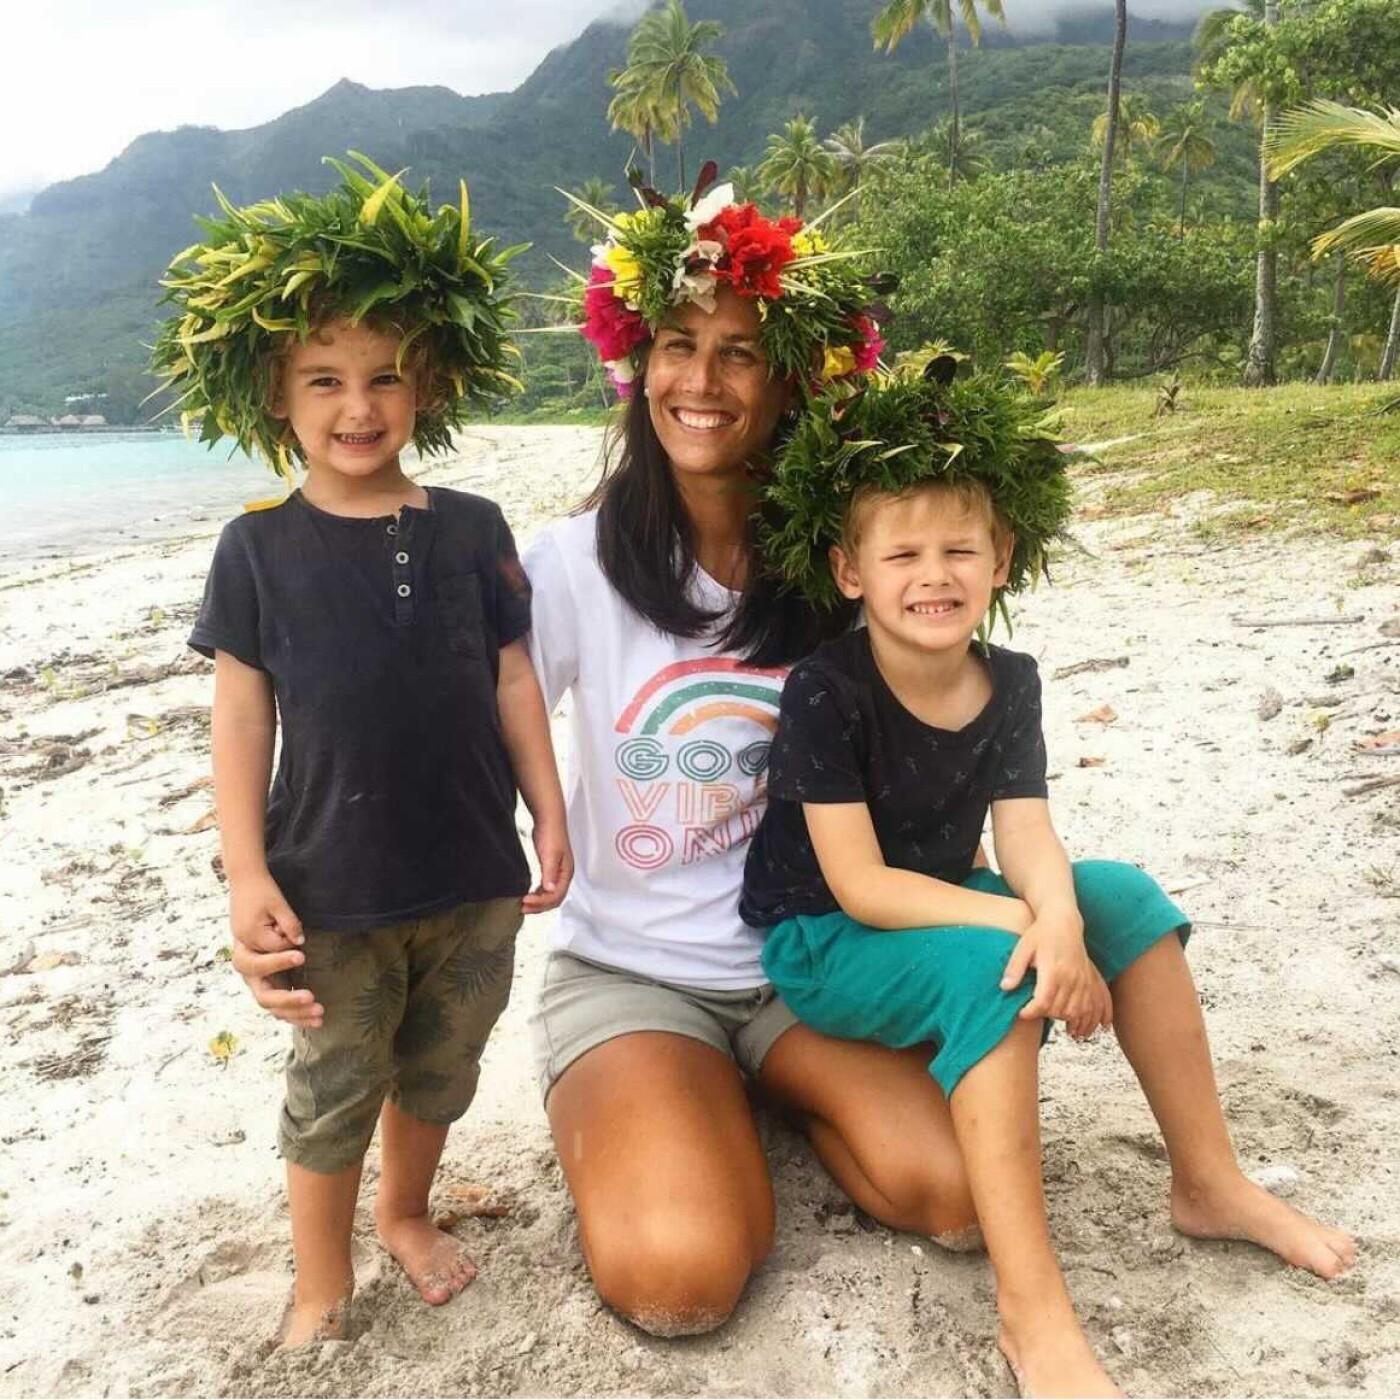 Coucou Les Filles #23 - Solene parle de sa vie a Tahiti - 31 03 2021 - StereoChic Radio